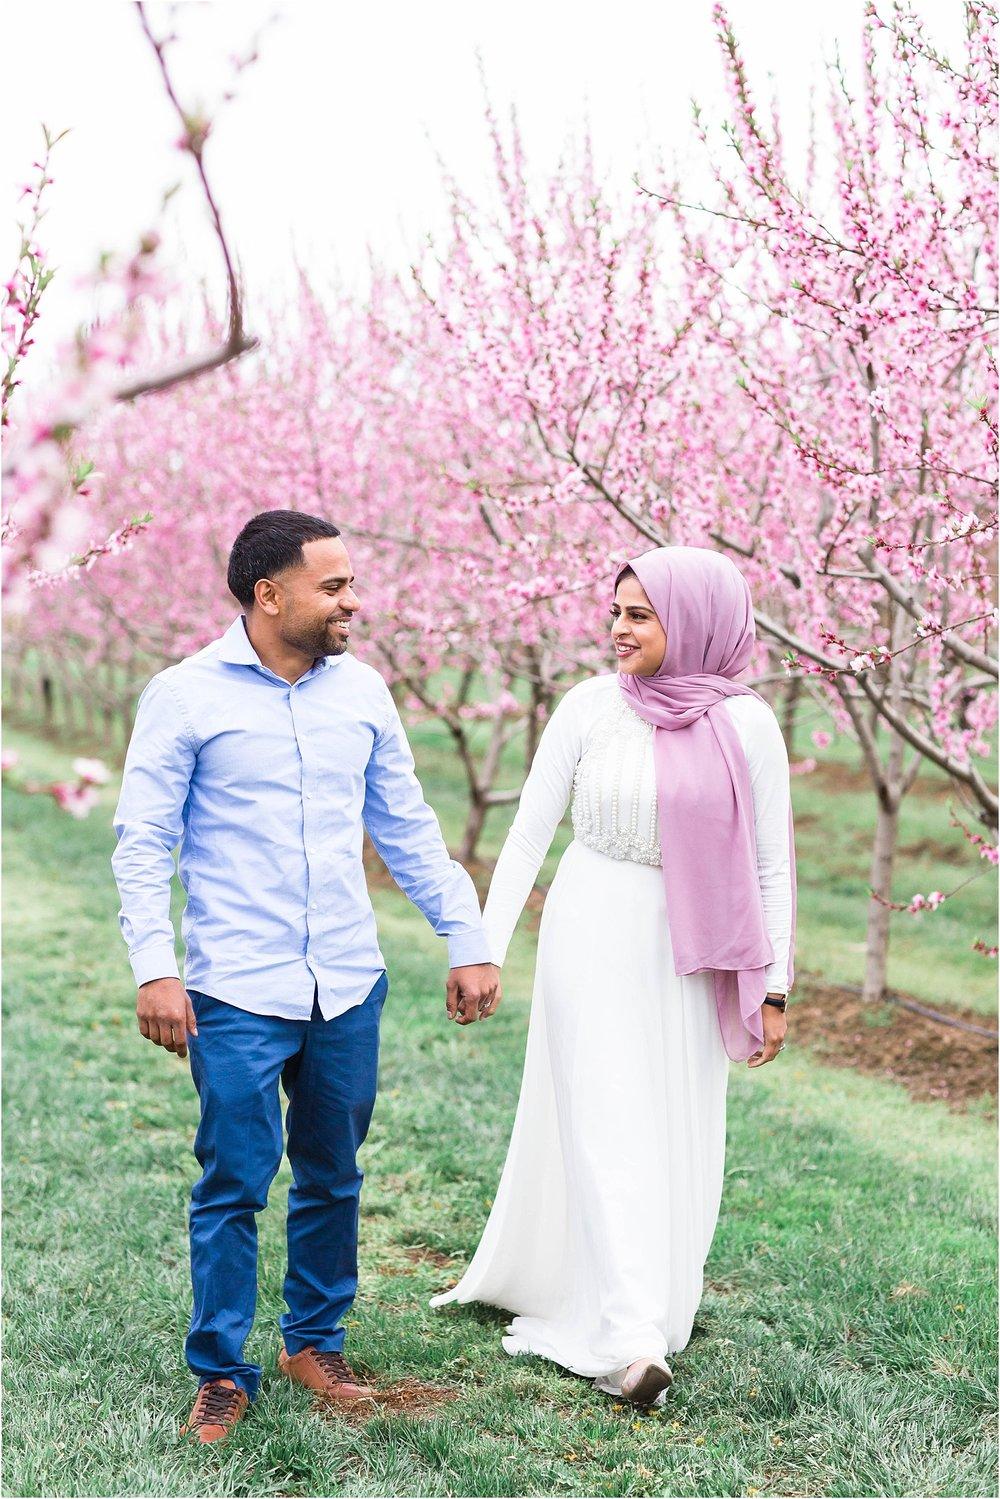 Niagara-on-the-lake-cherry-blossom-farm-Engagement-Session-Toronto-Mississauga-Brampton-Scarborough-GTA-Pakistani-Indian-Wedding-Engagement-Photographer-Photography_0001.jpg